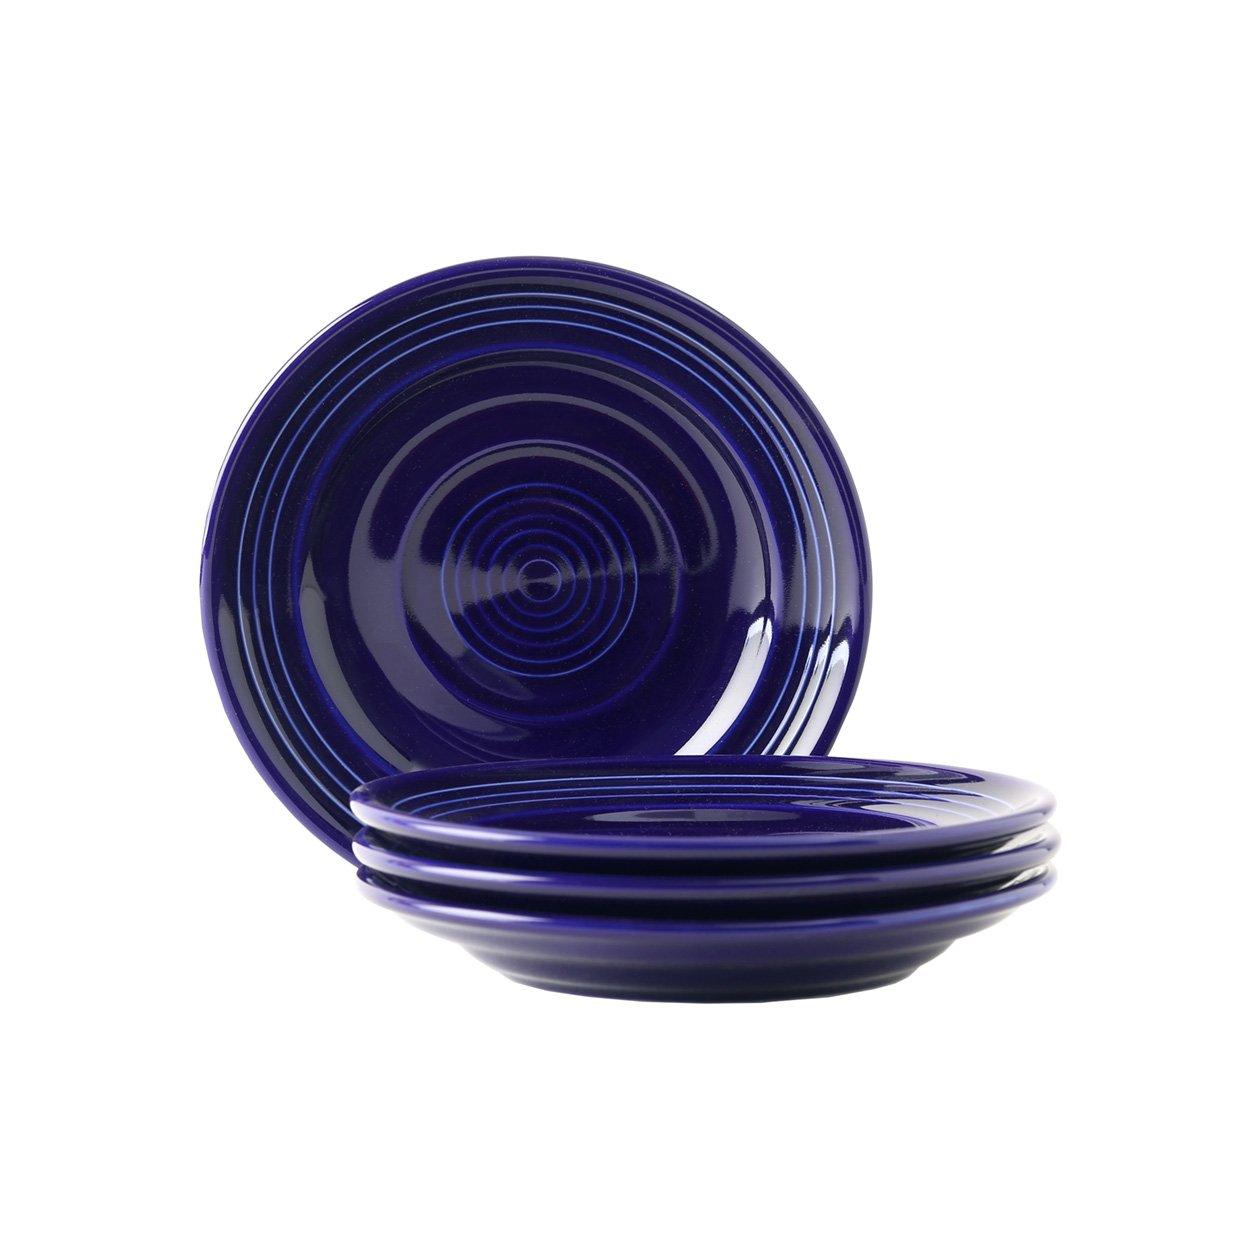 Tuxton Home Concentrix Side Plate (Set of 4), 6 1/4